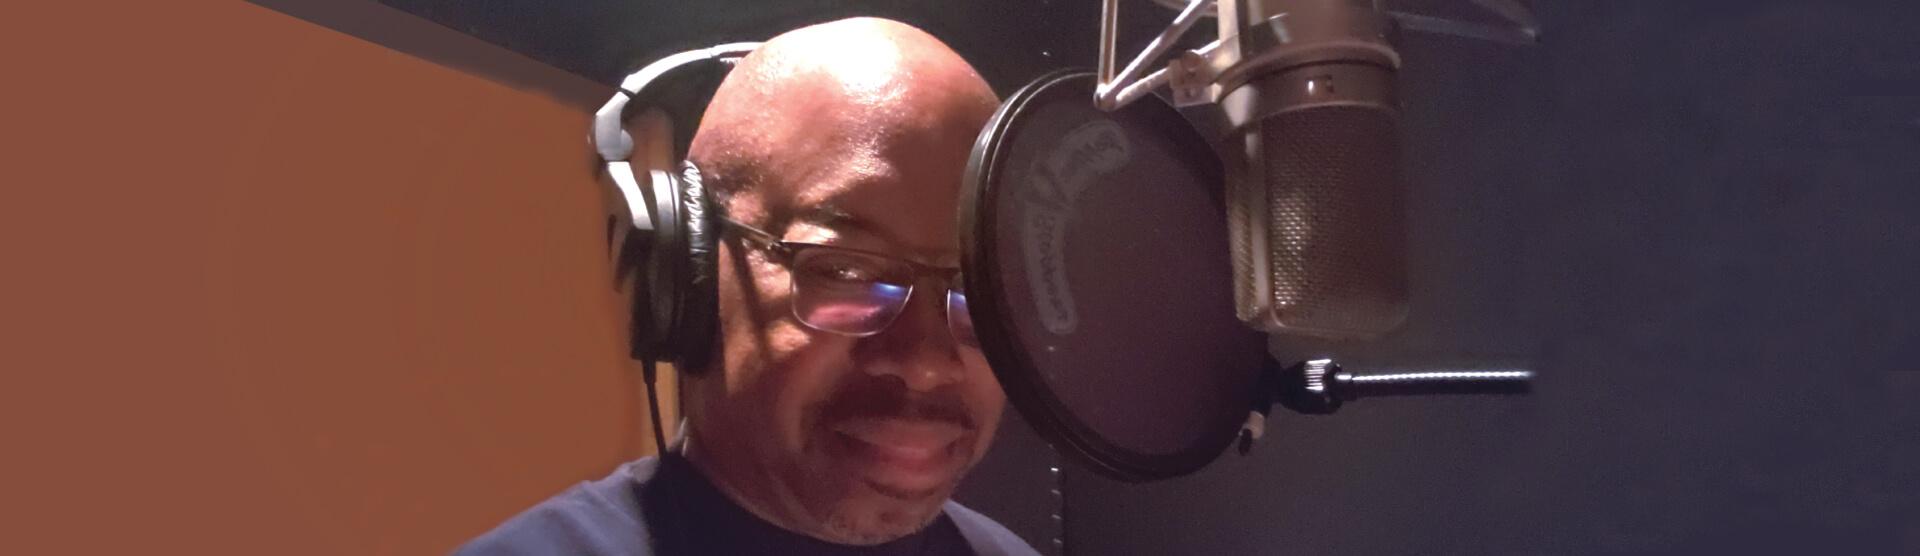 Vincent Eury Voice Over Actor Vocalist Background